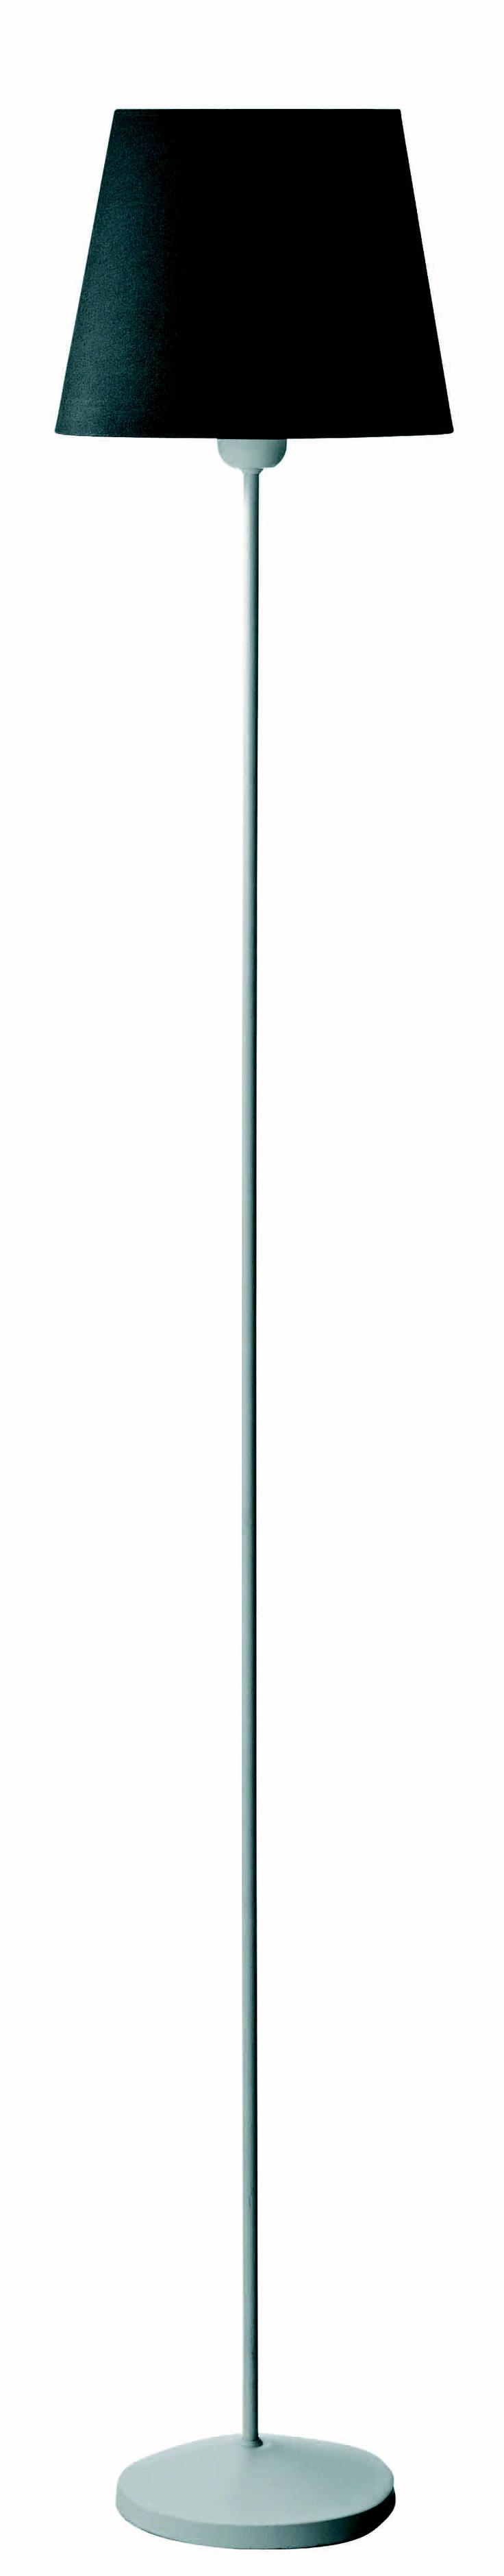 ASHBY ΜΕΤΑΛΛΙΚΗ ΕΠΙΔΑΠΕΔΙΑ ΒΑΣΗ ΦΩΤ/ΚΟΥ ΛΕΥΚΗ  70 € #habitatgr